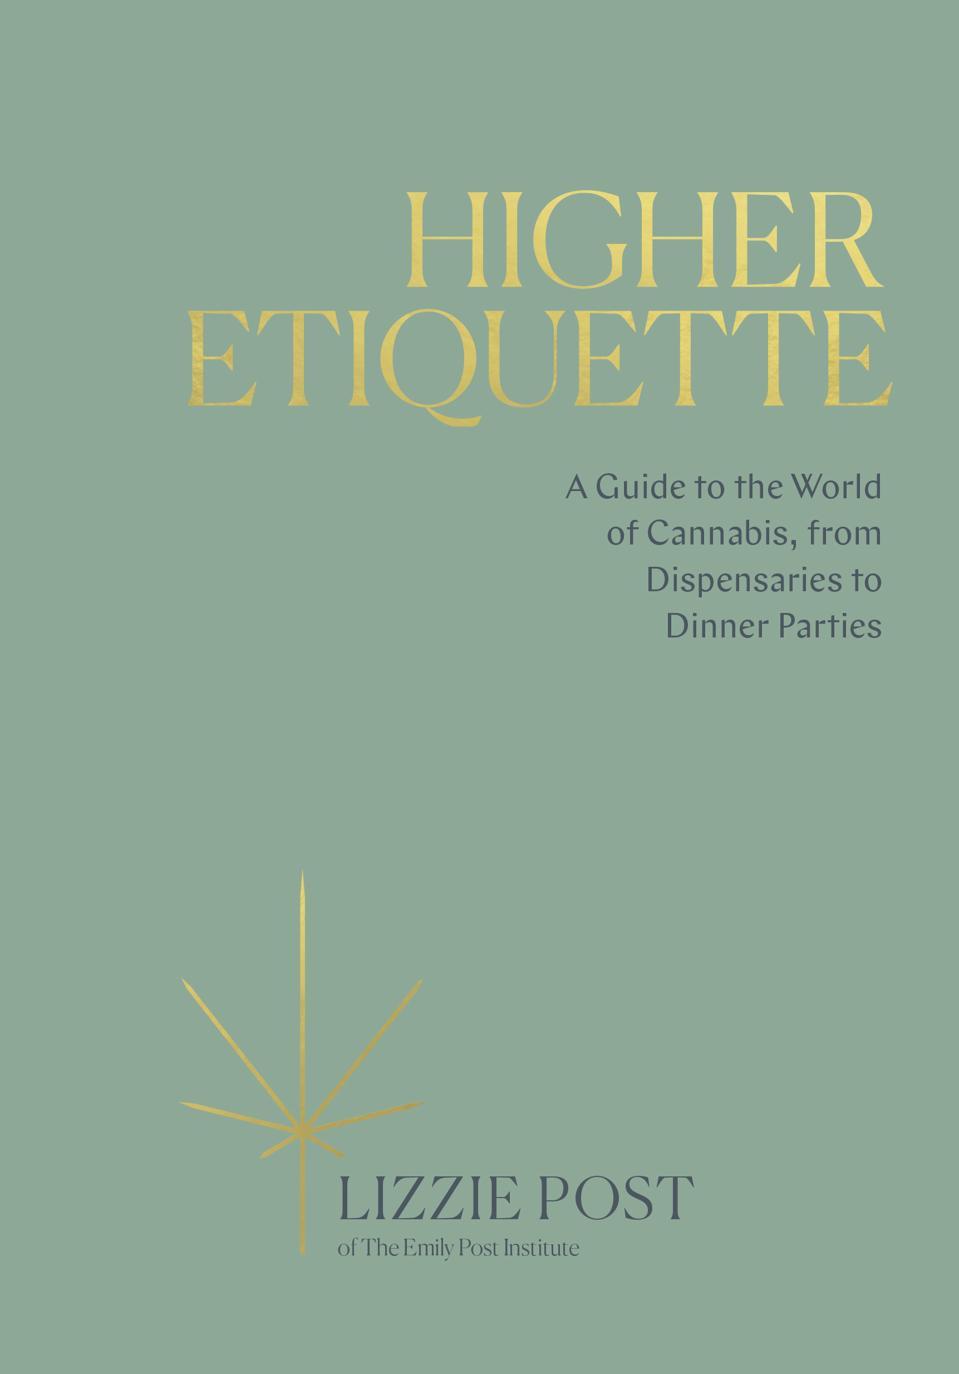 Higher Etiquette, Lizzie Post, Emily Post Institute, cannabis books, cannabis culture